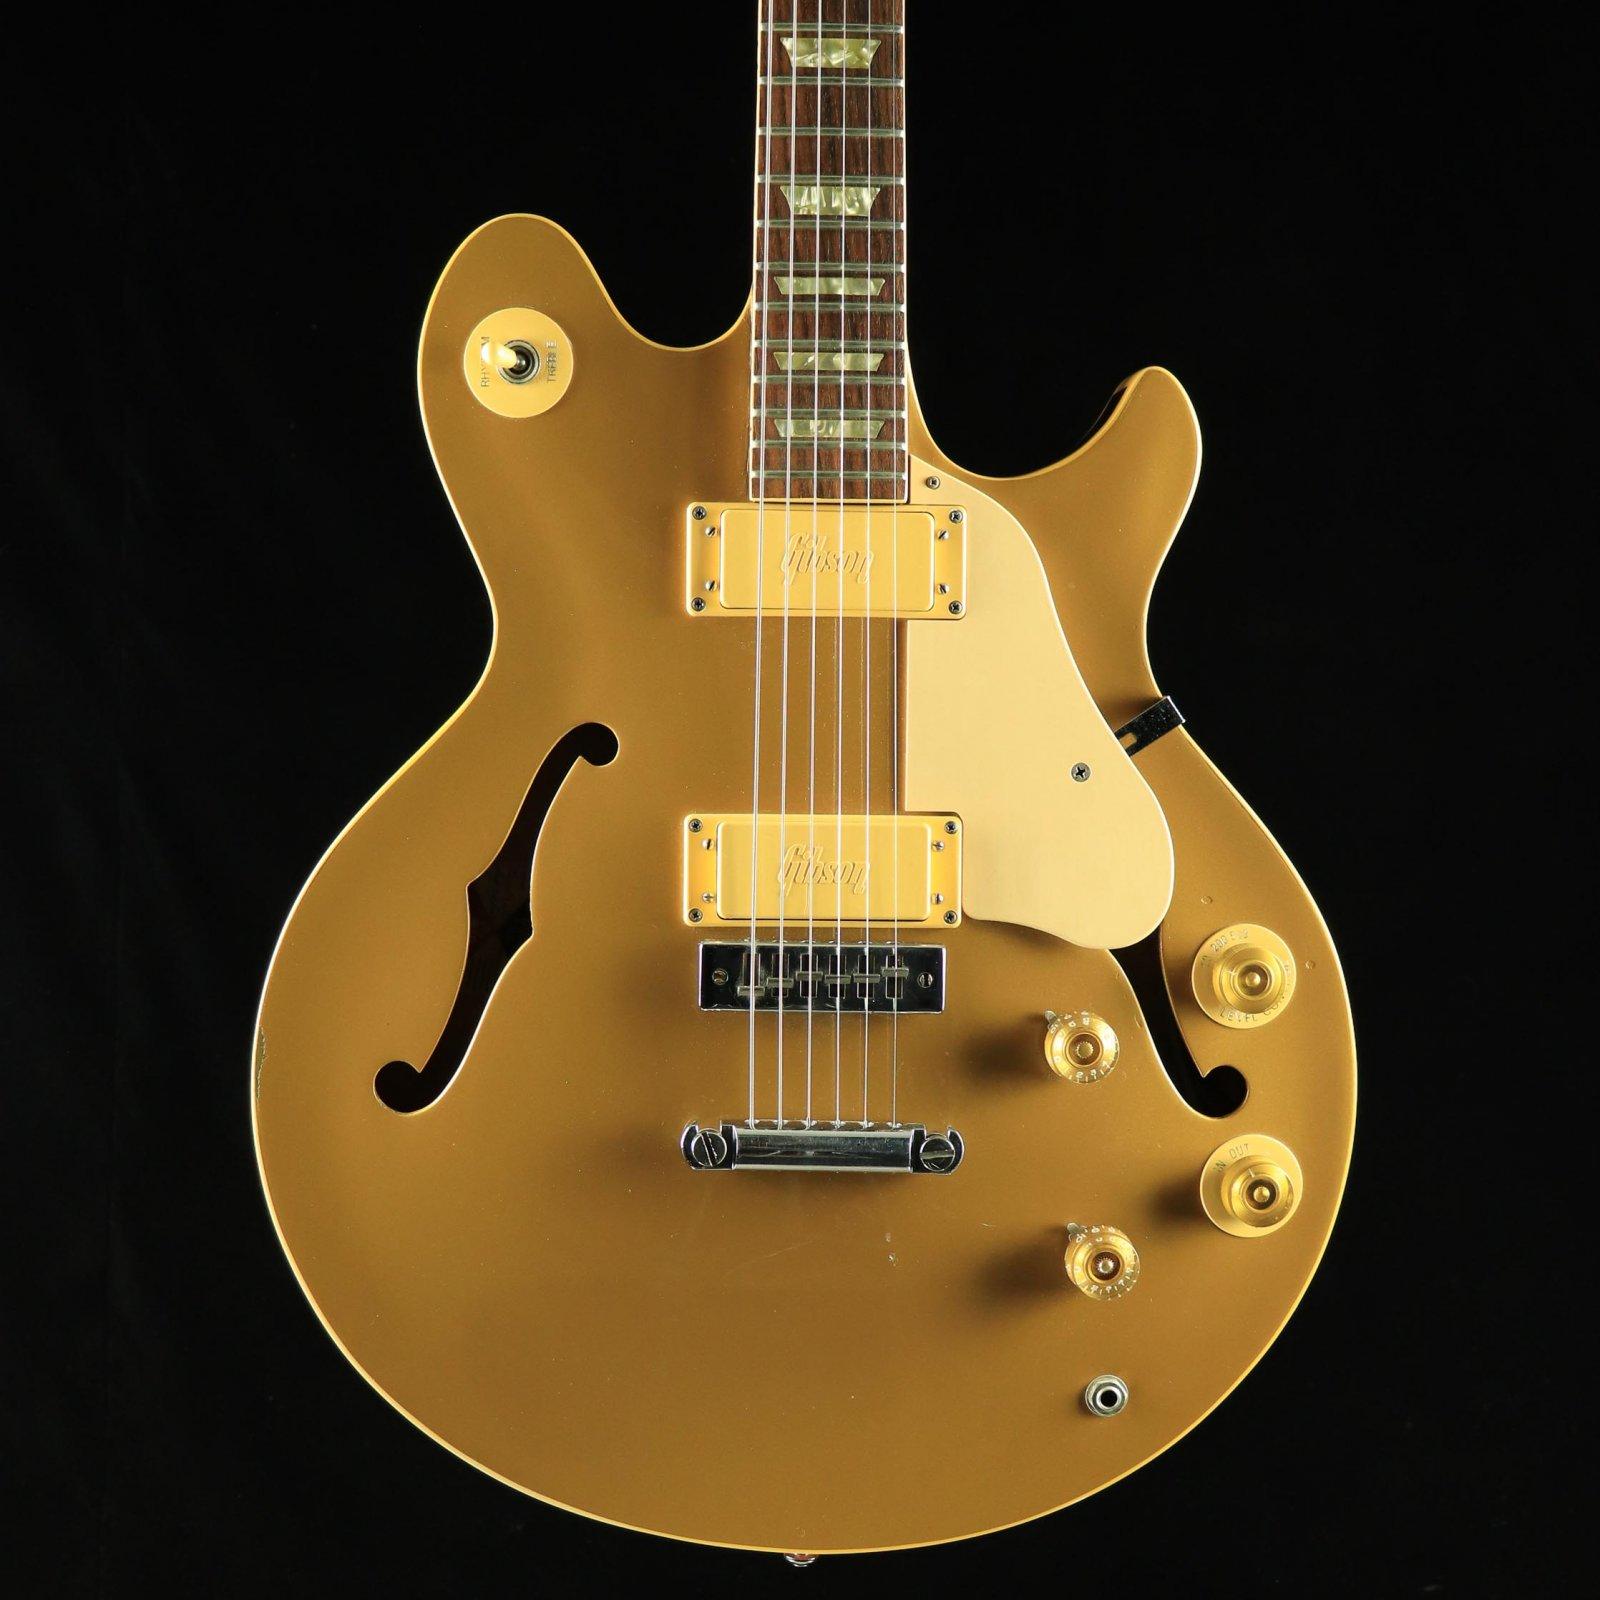 Gibson Les Paul Signature - Goldtop